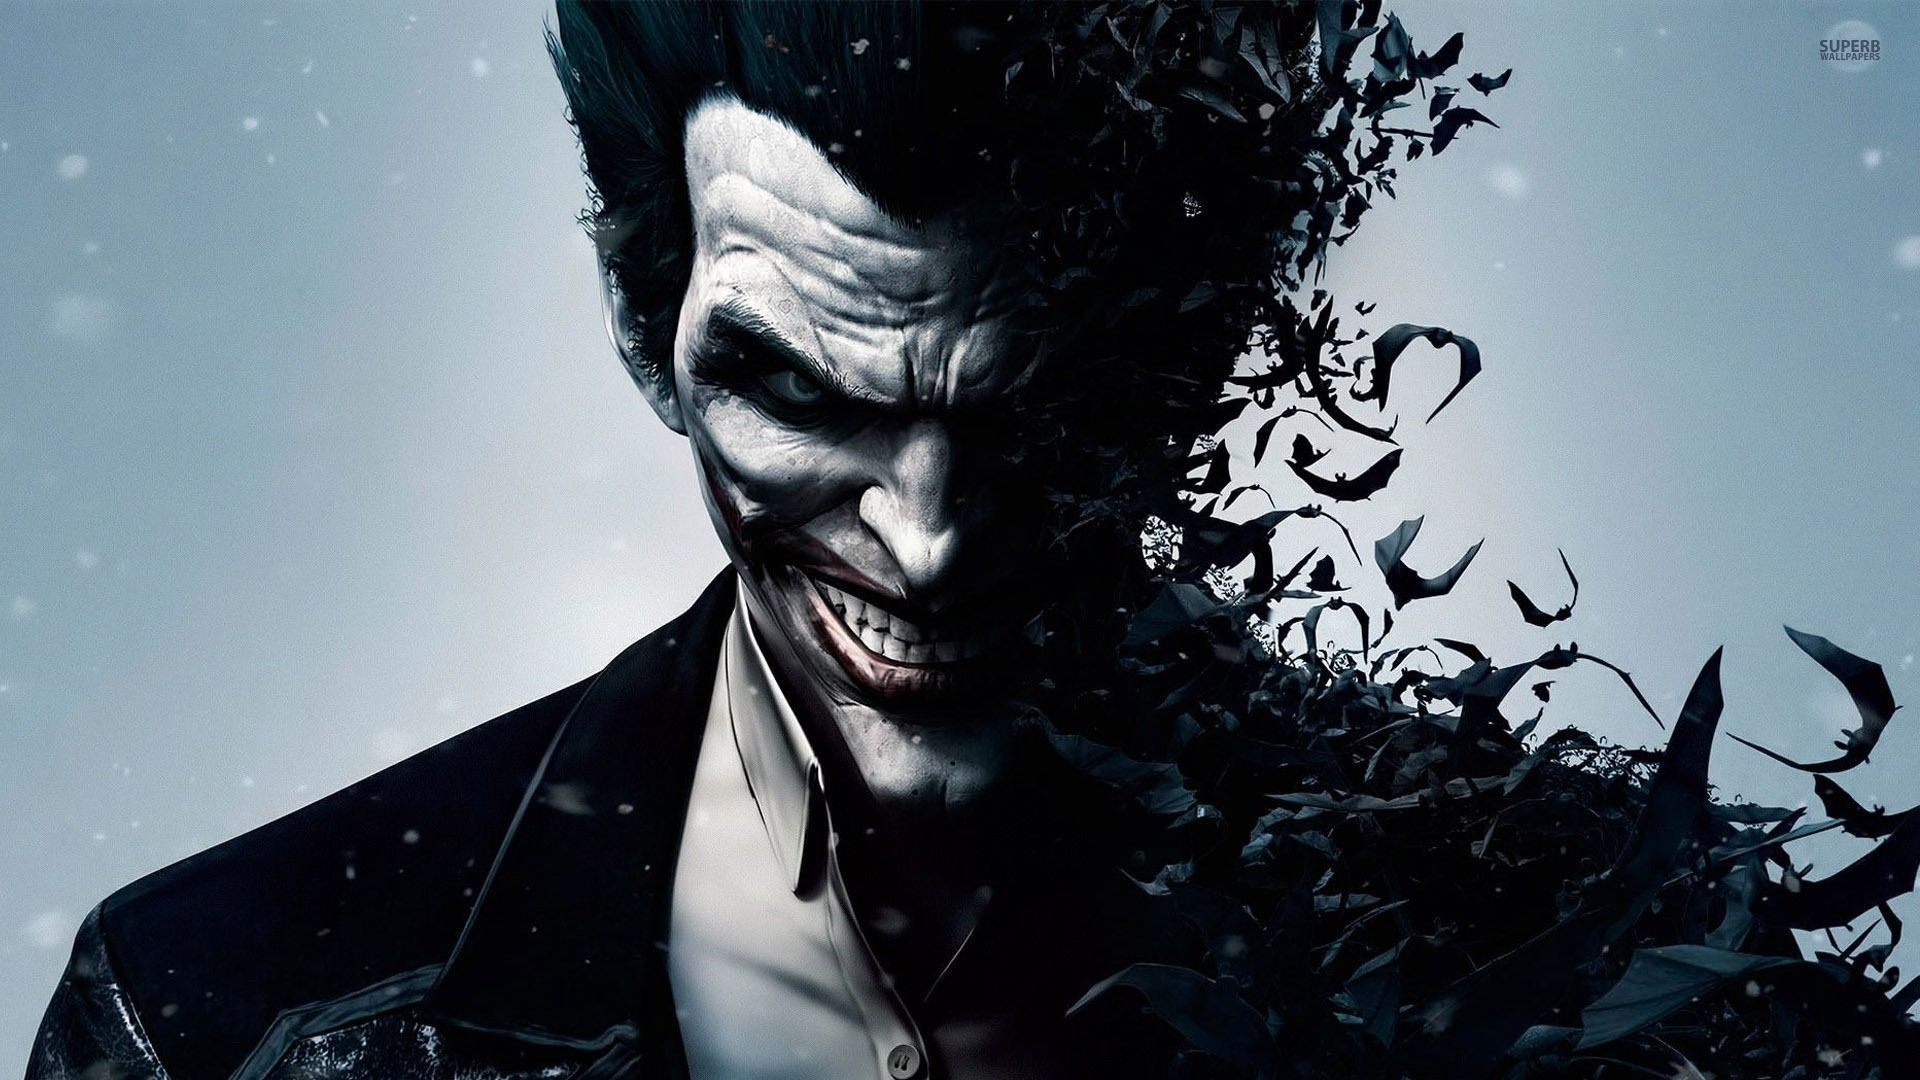 Joker Desktop Wallpapers Top Free Joker Desktop Backgrounds Wallpaperaccess